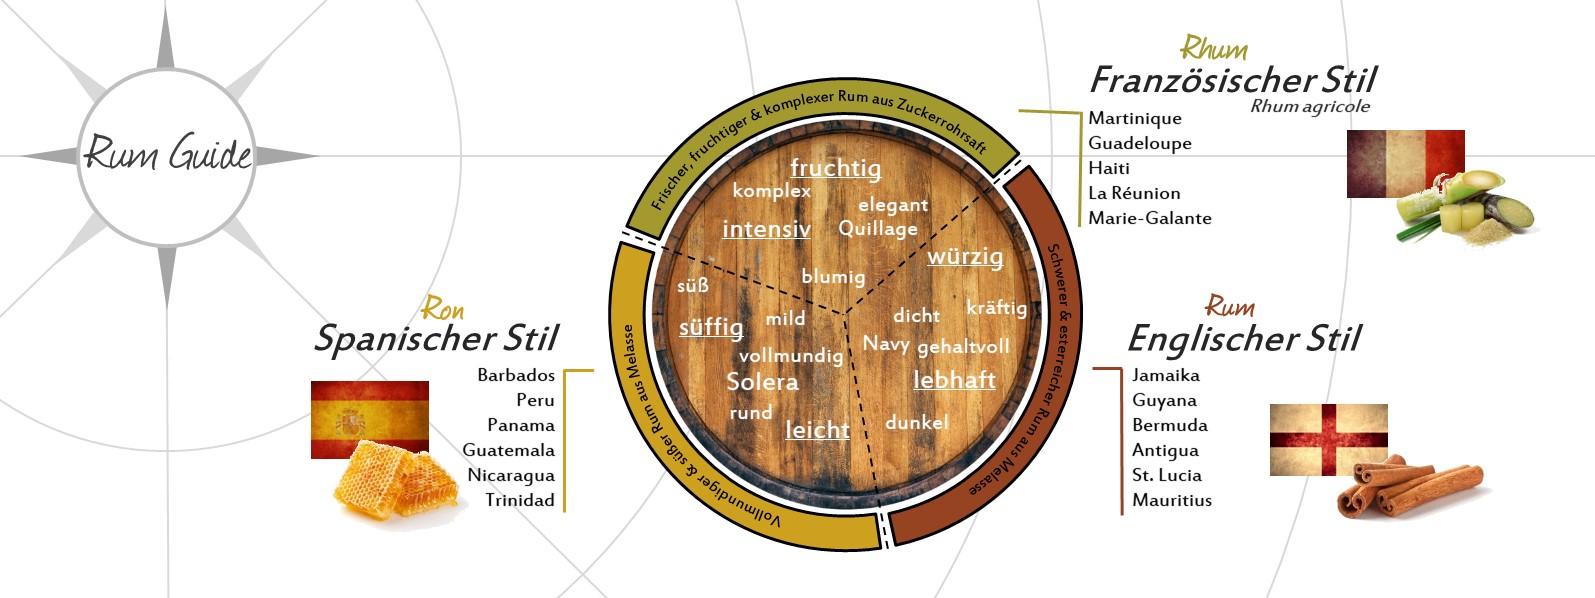 Rum-Guide